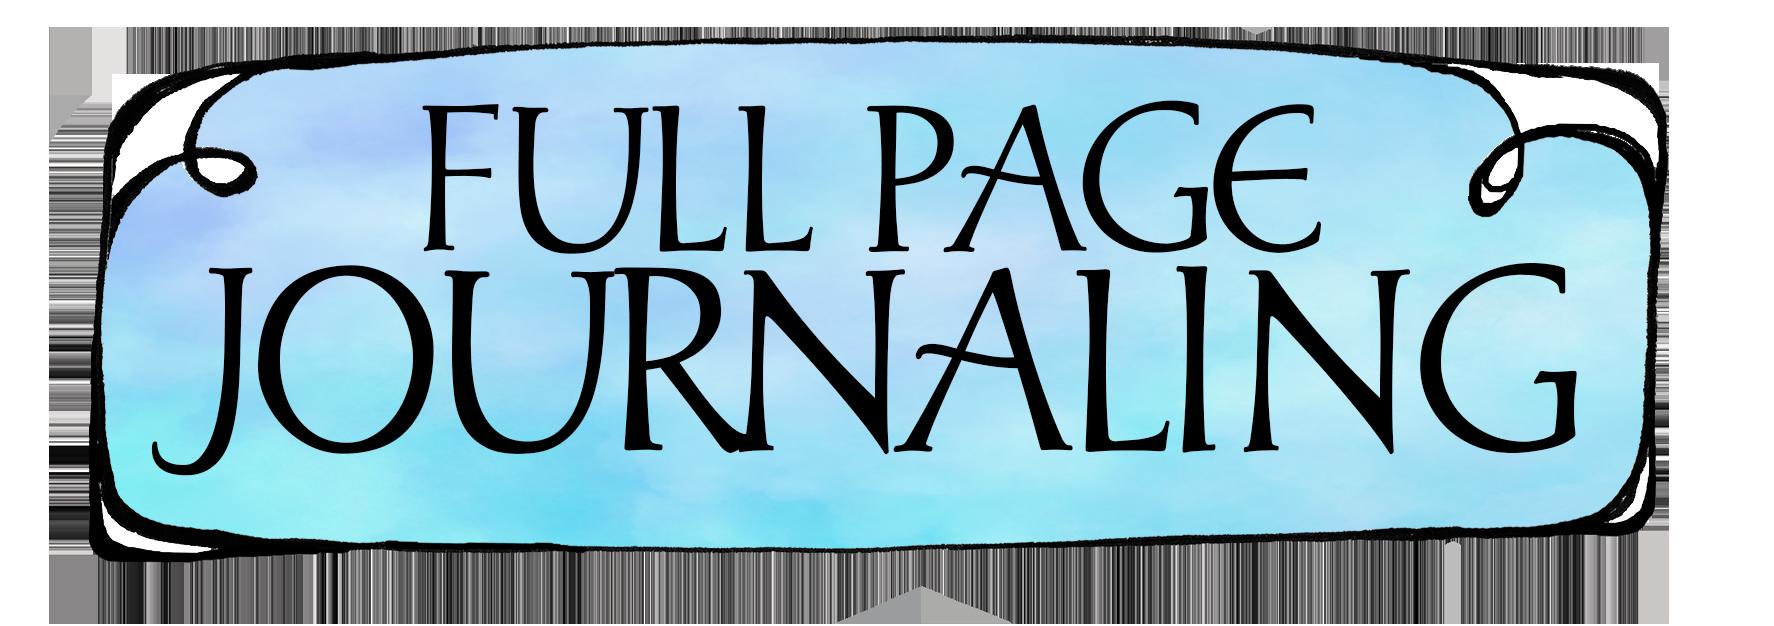 Full Page Journaling